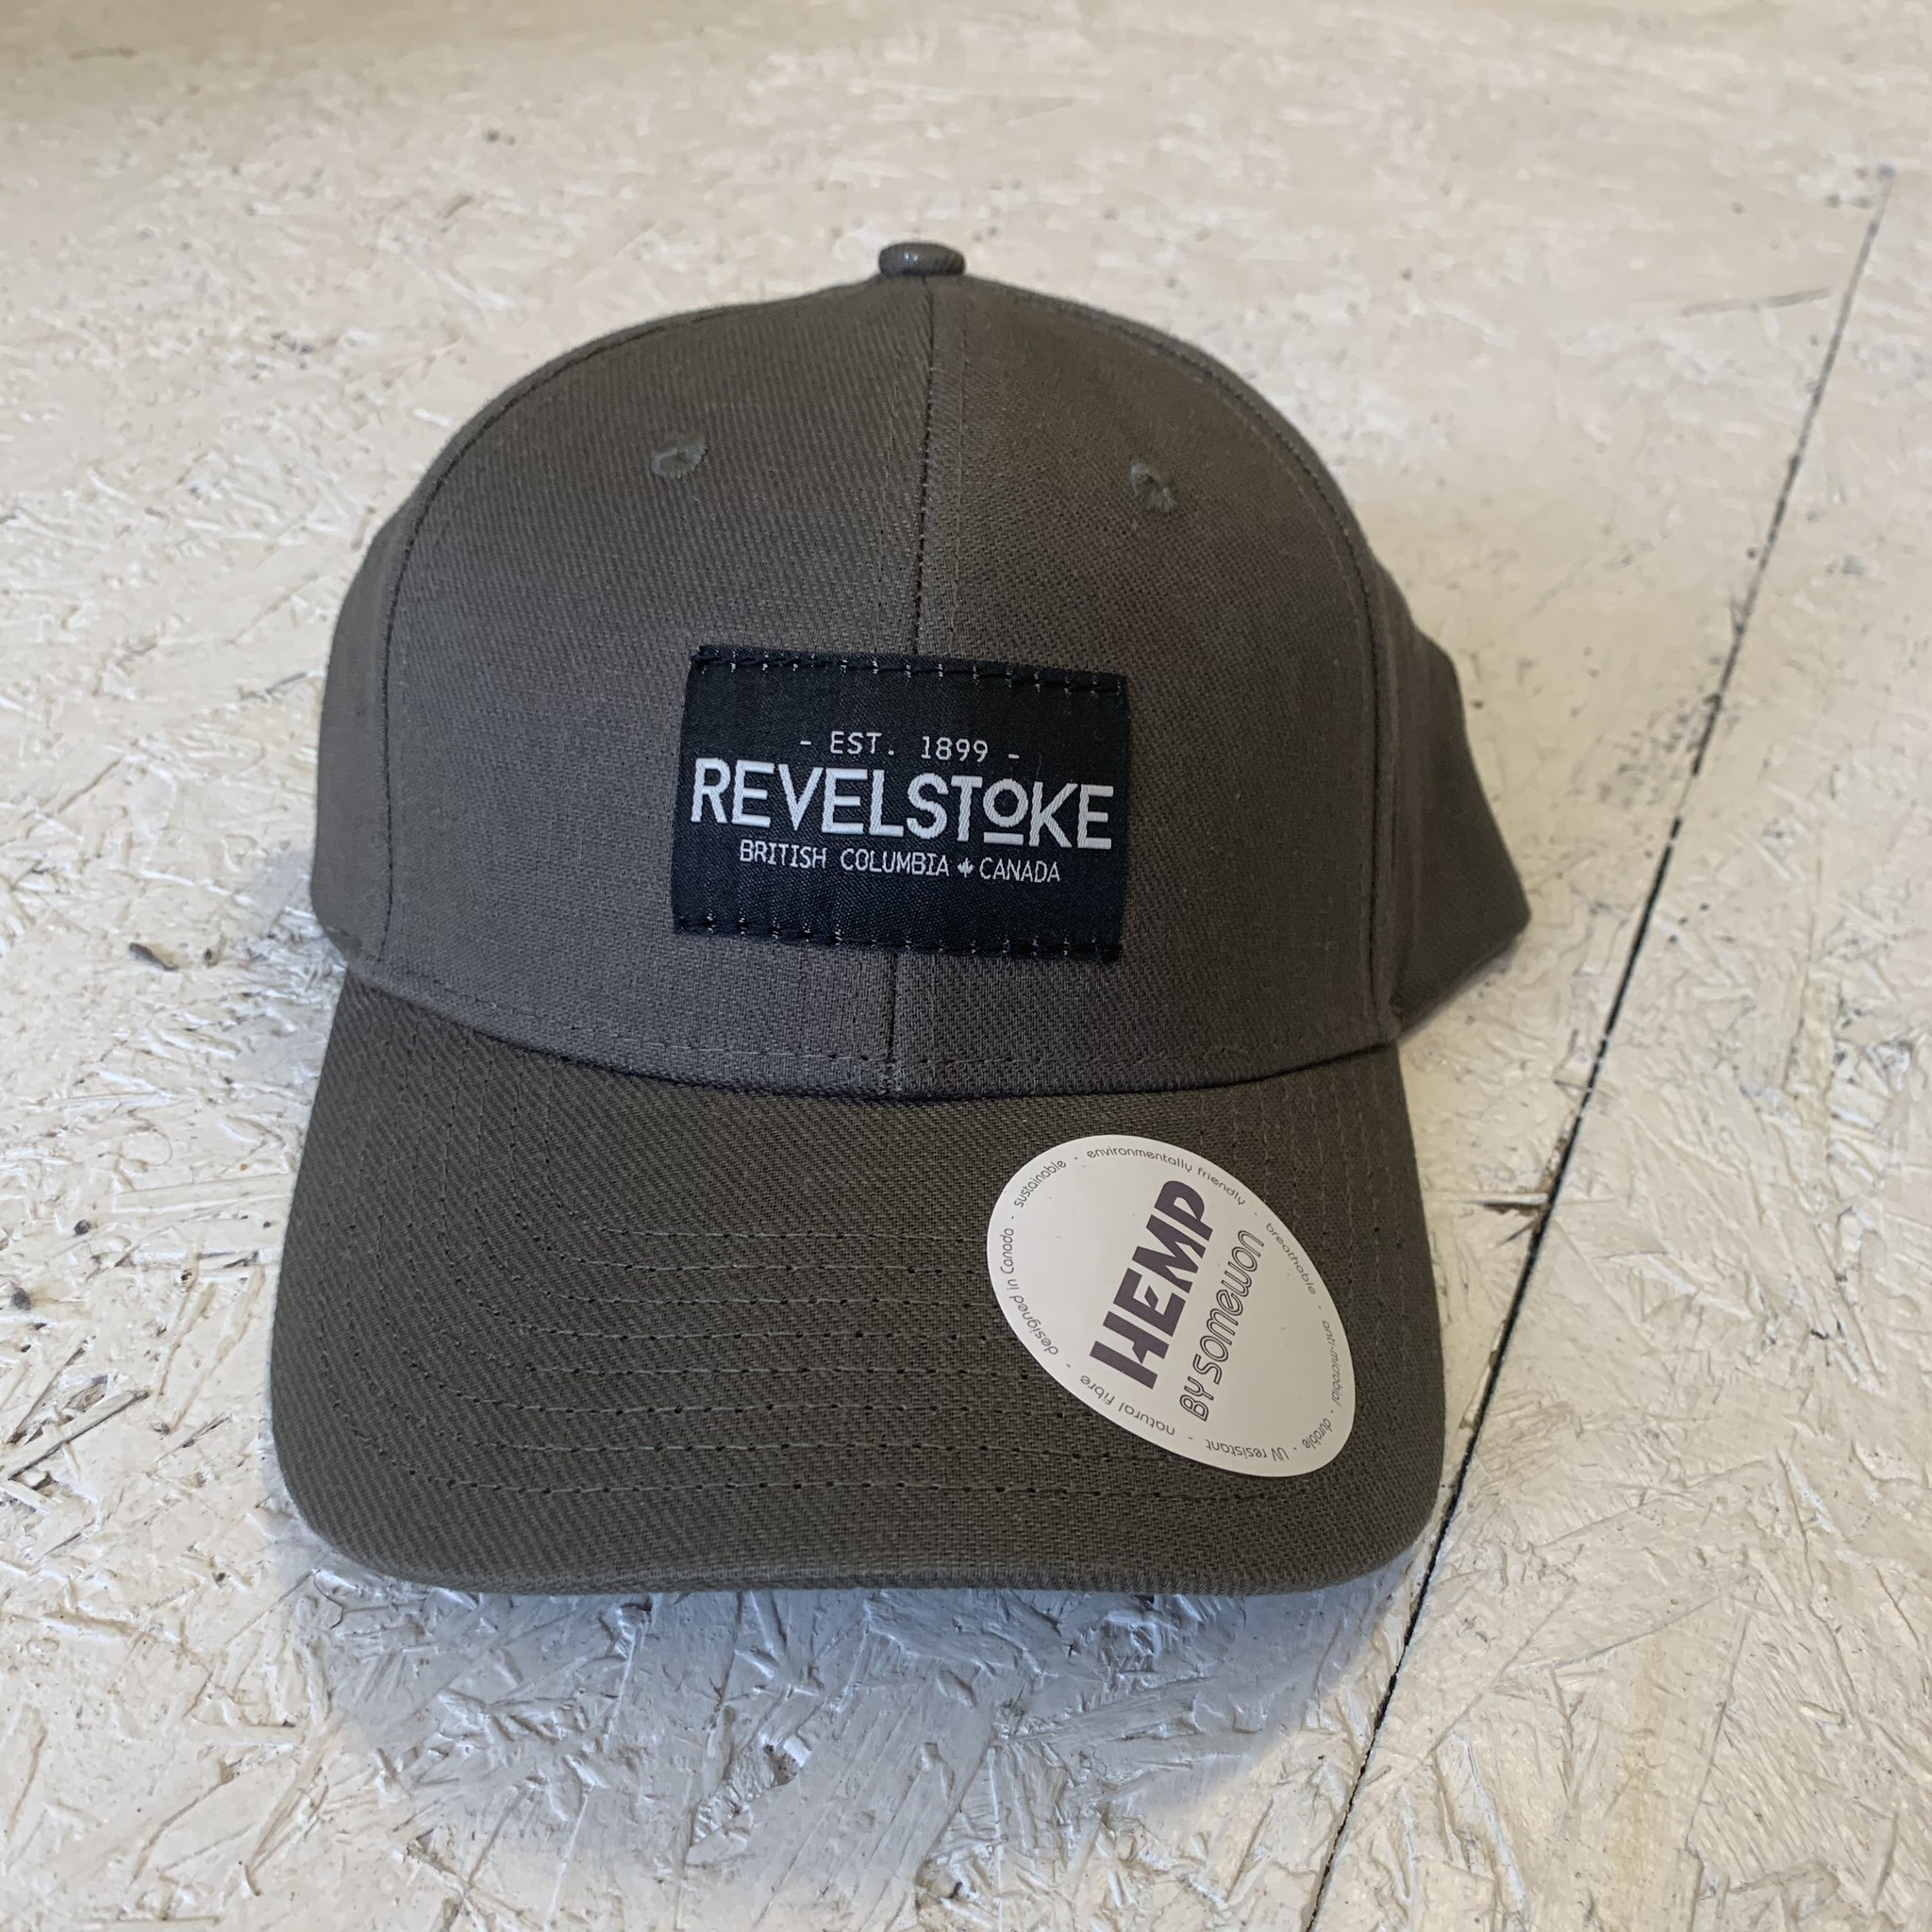 Revelstoke Trading Post Revelstoke - Trading Co Hemp Curve Brim Cap - Olive